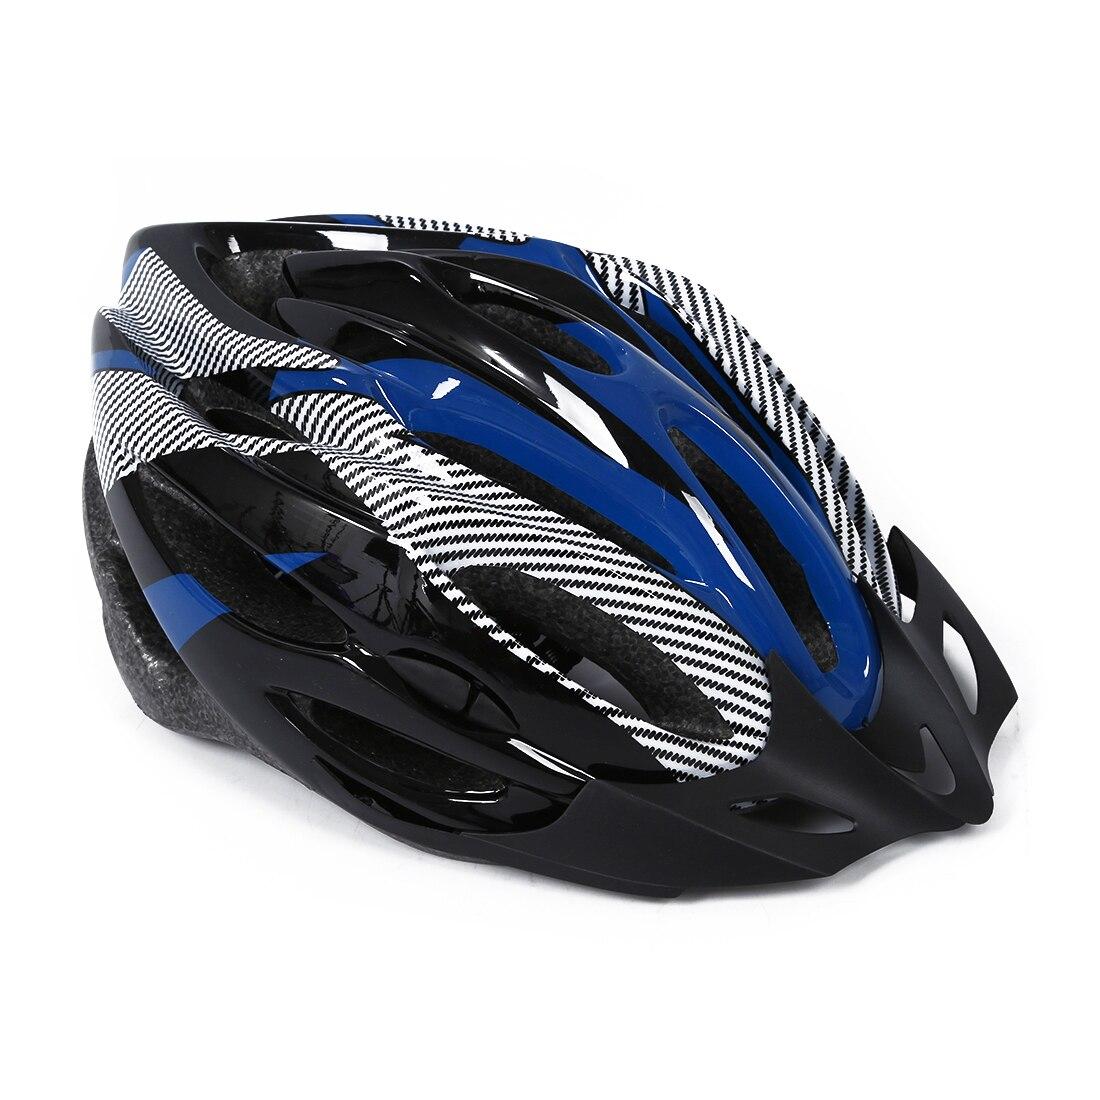 Blue Helmet visor Cycling Mountain Bike Bicycle Helmet bike Велосипедный шлем